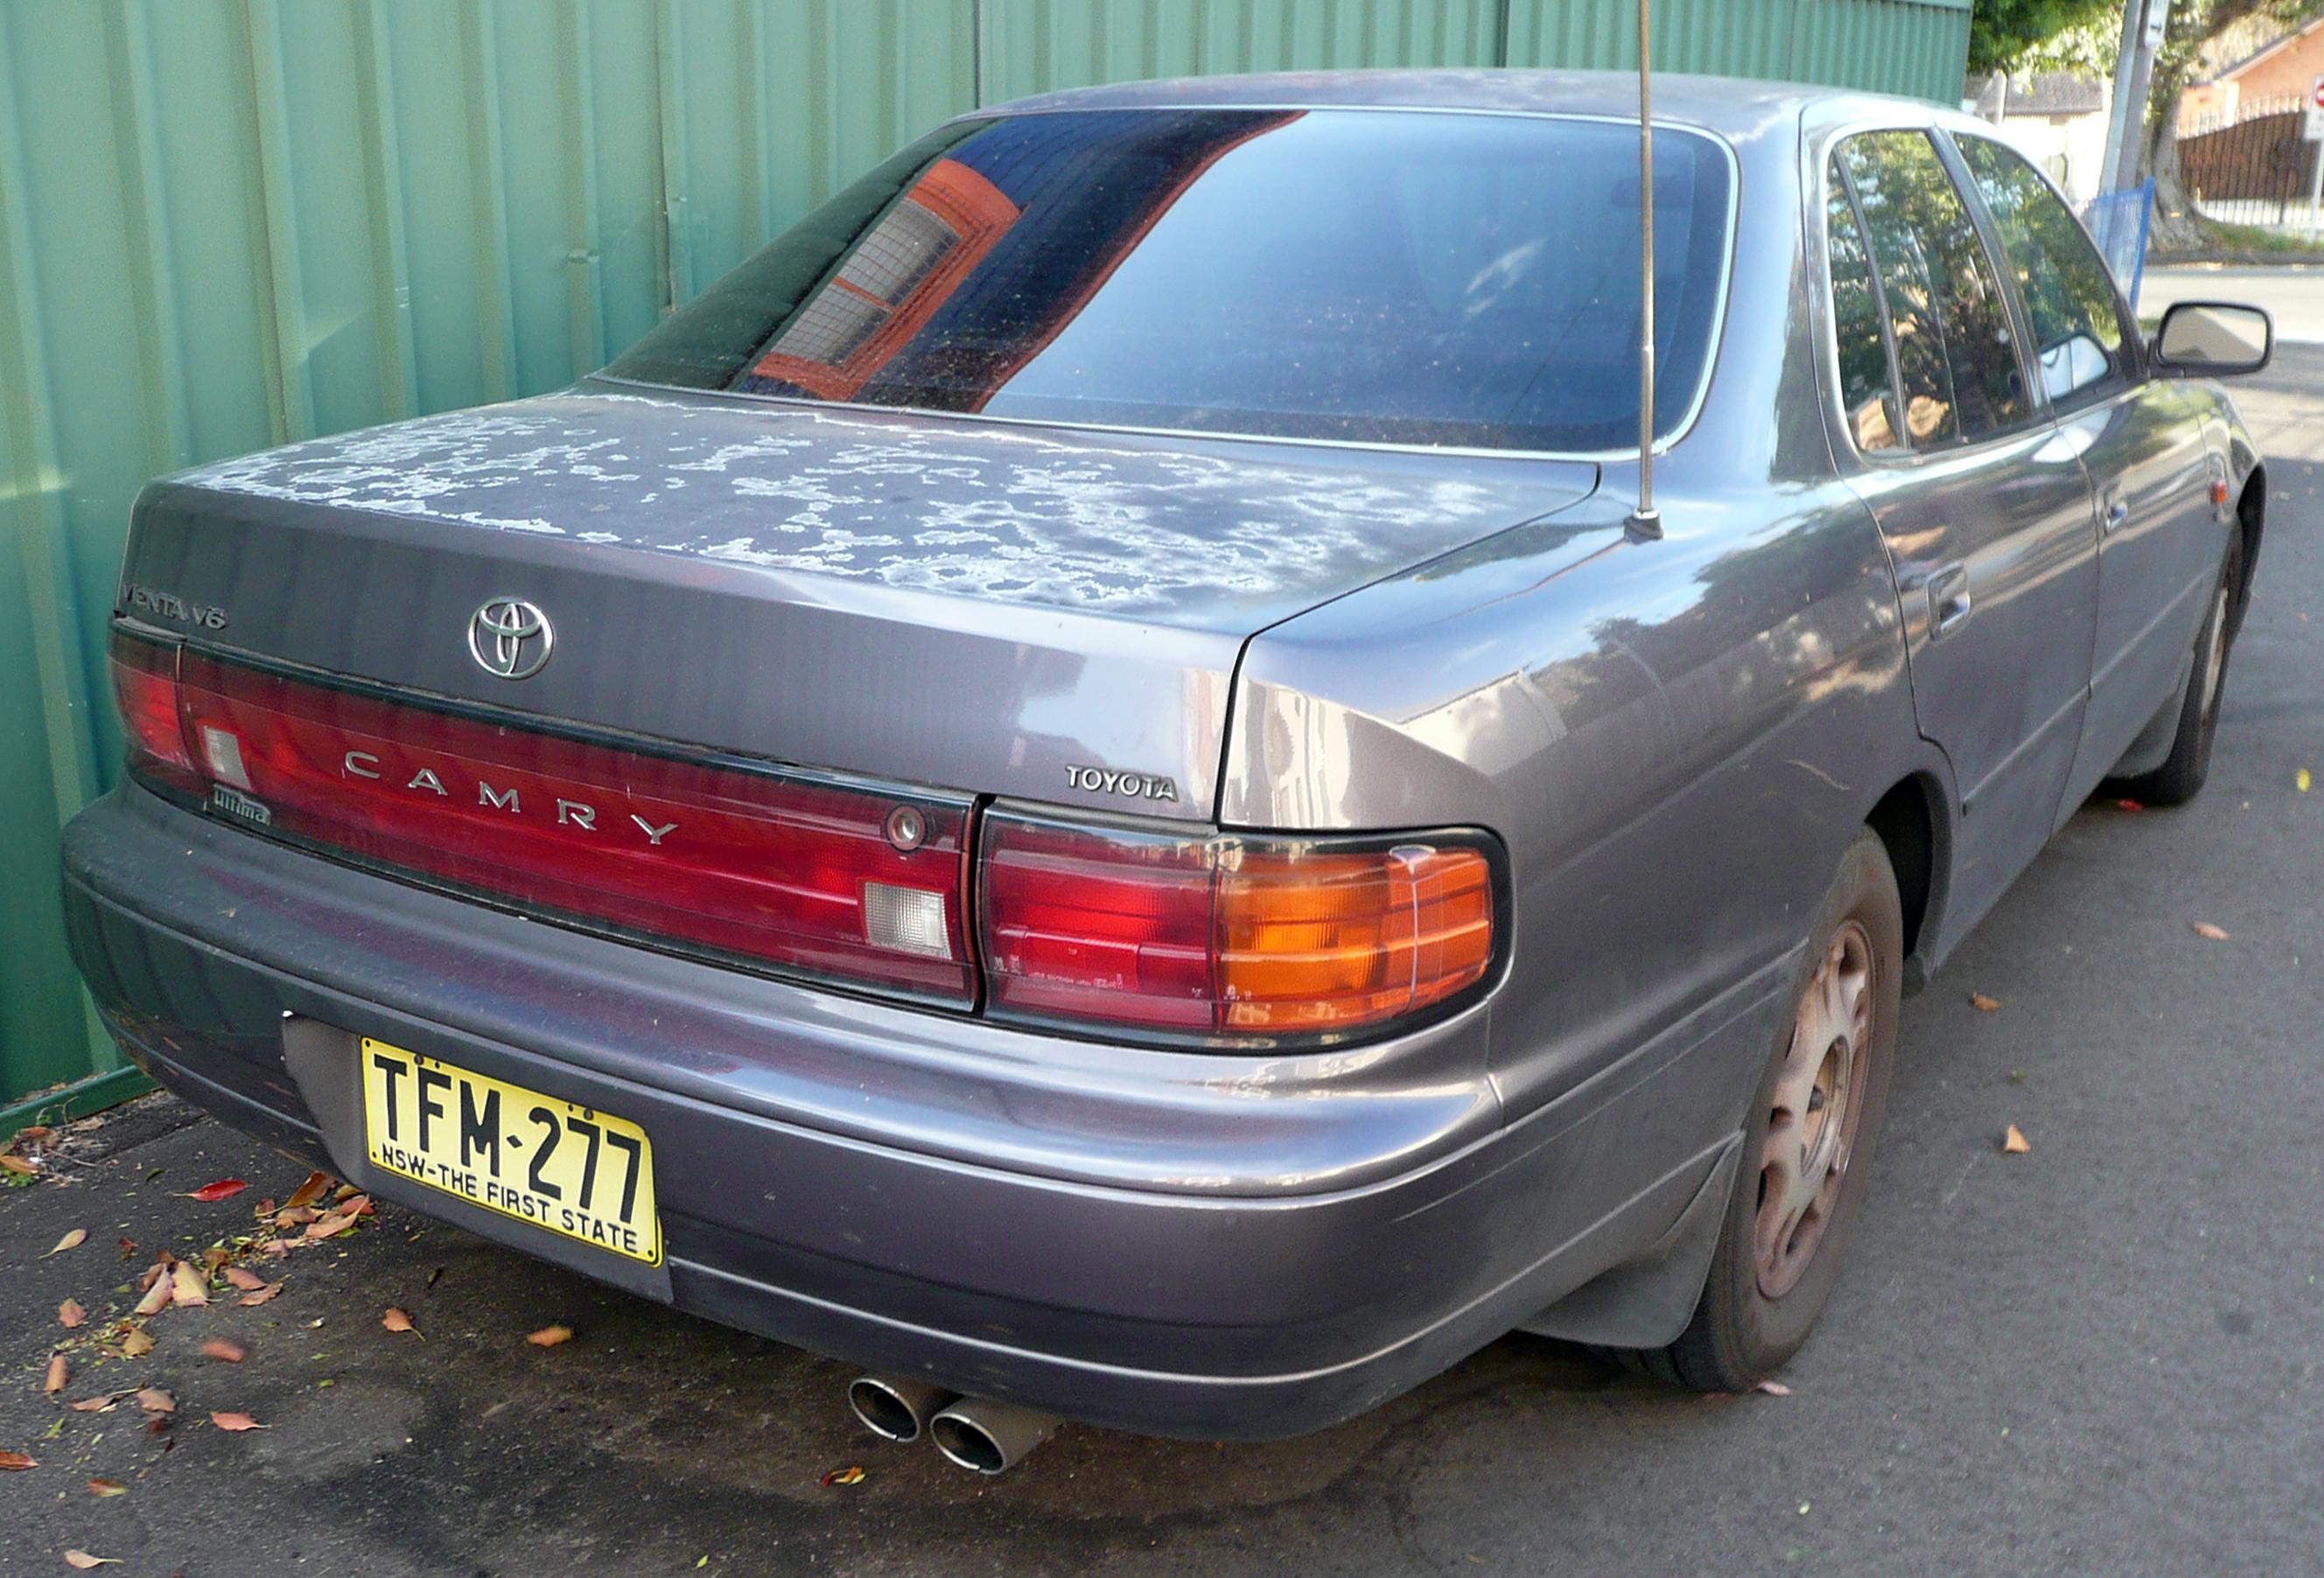 File 1993 1995 toyota camry vienta vdv10 ultima sedan 03 jpg